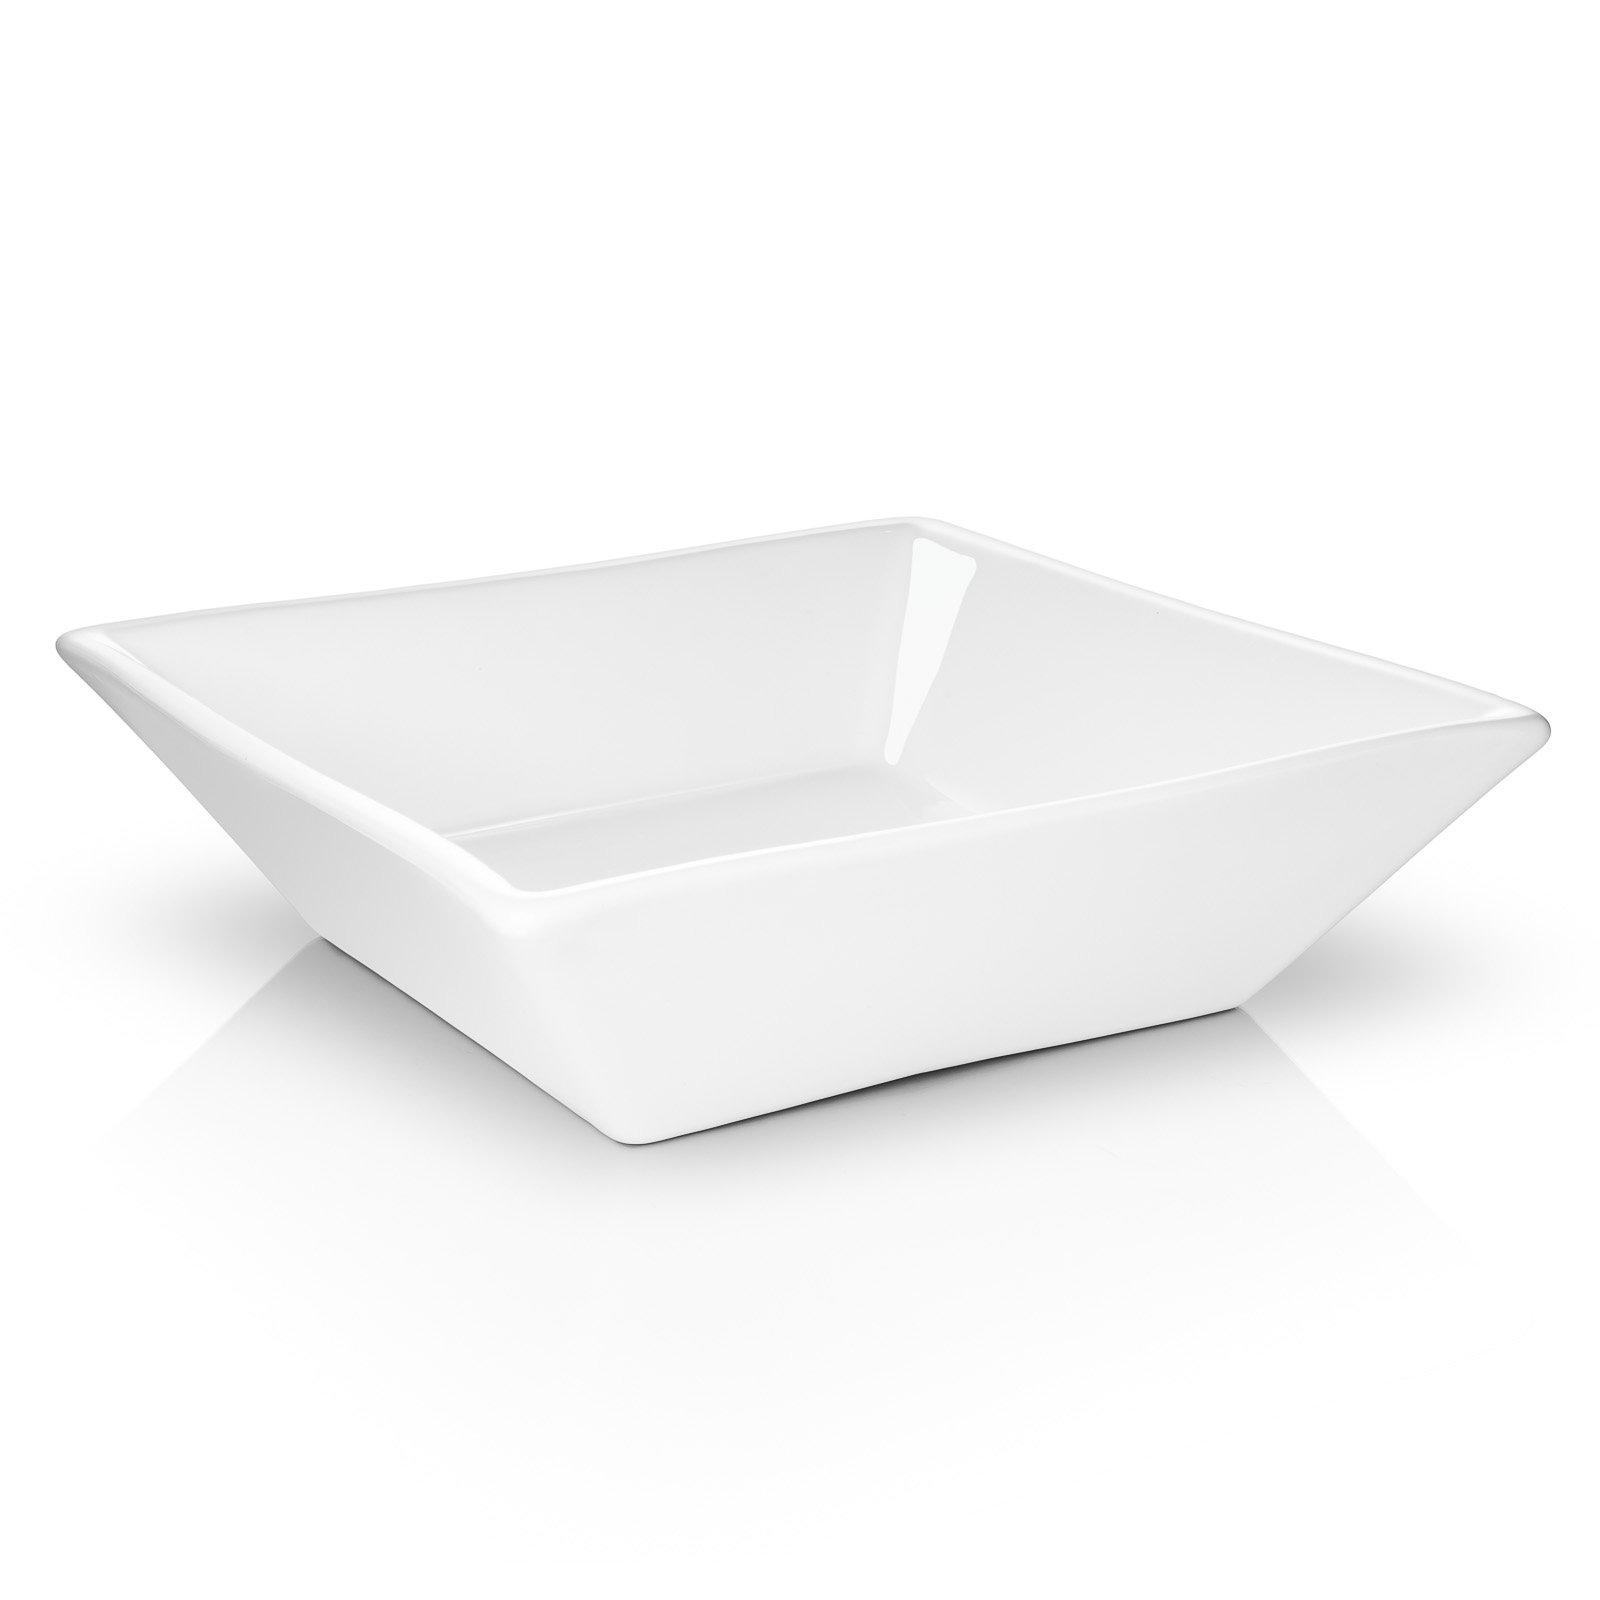 Miligoré 16'' x 16'' Beveled Square White Ceramic Vessel Sink - Modern Above Counter Bathroom Vanity Bowl by Miligoré